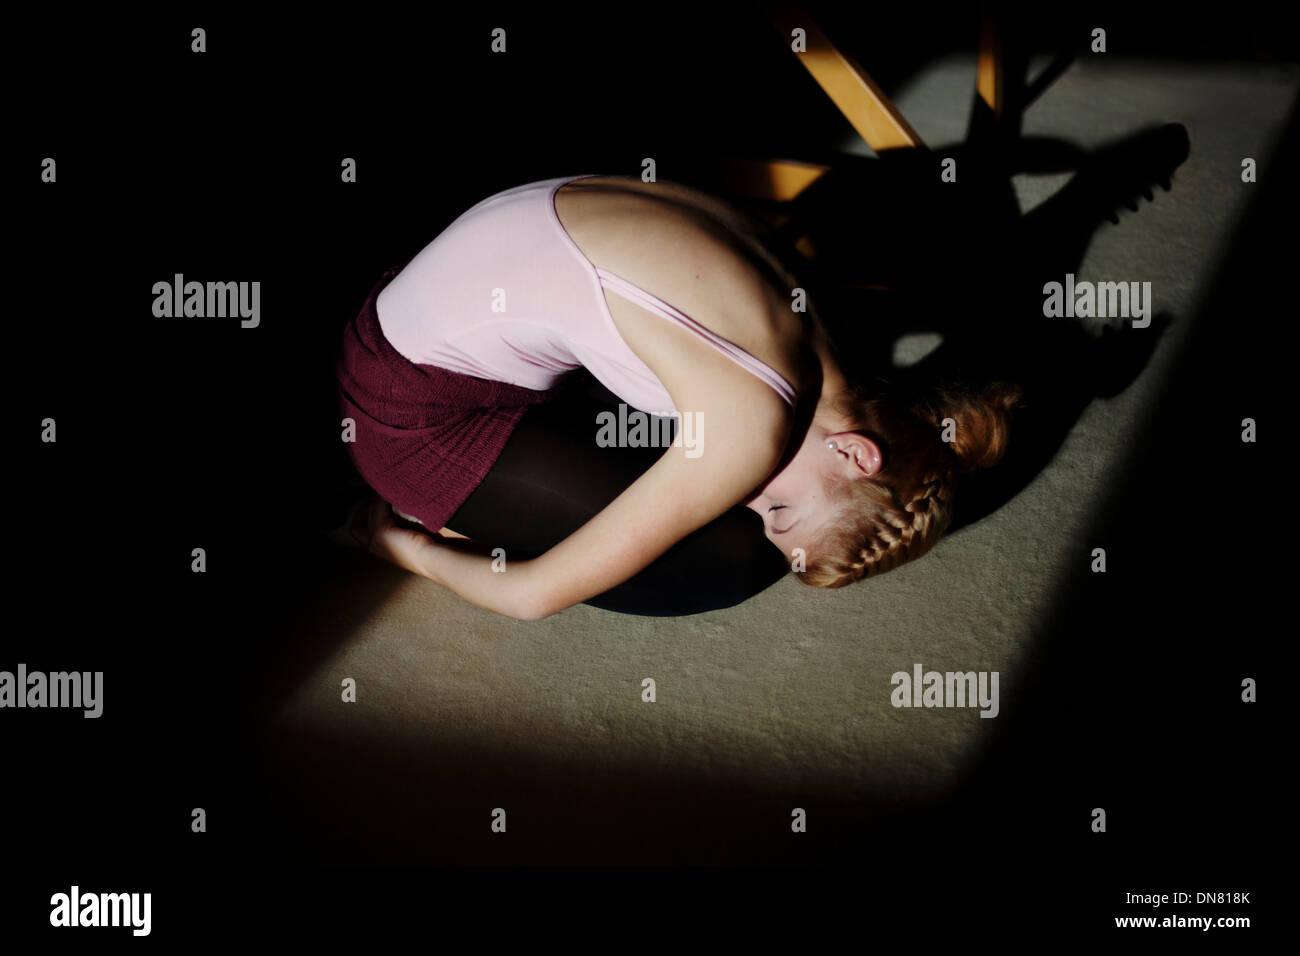 Junge Frau kniet auf dem Boden, Porträt Stockbild